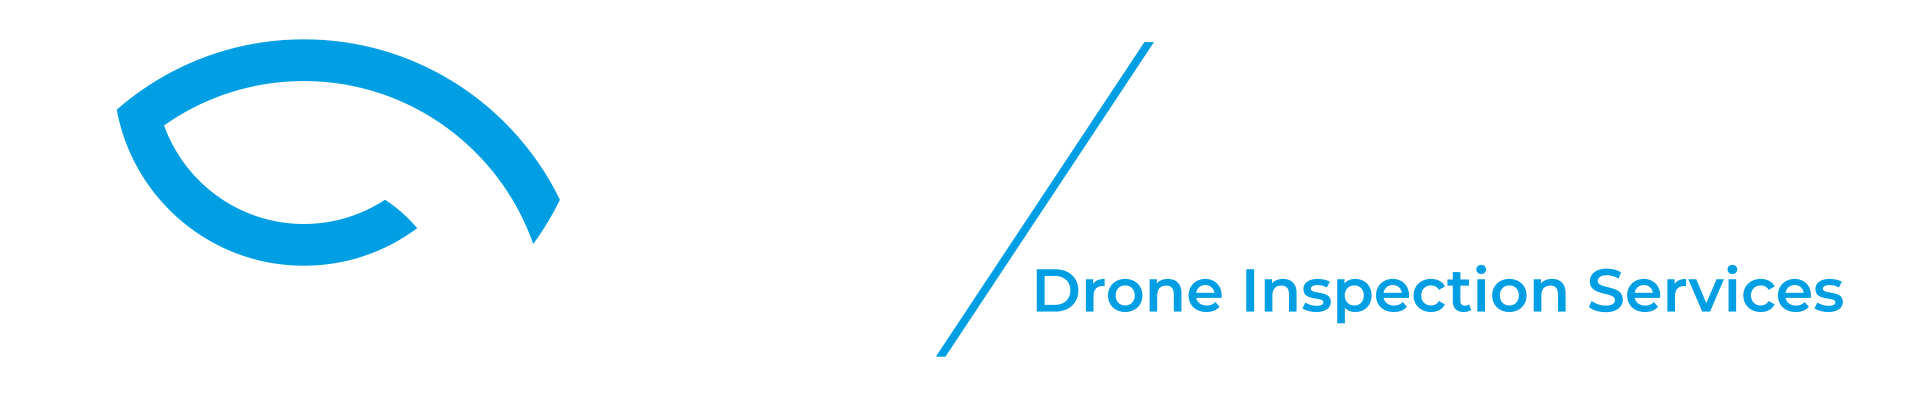 logo skyebase